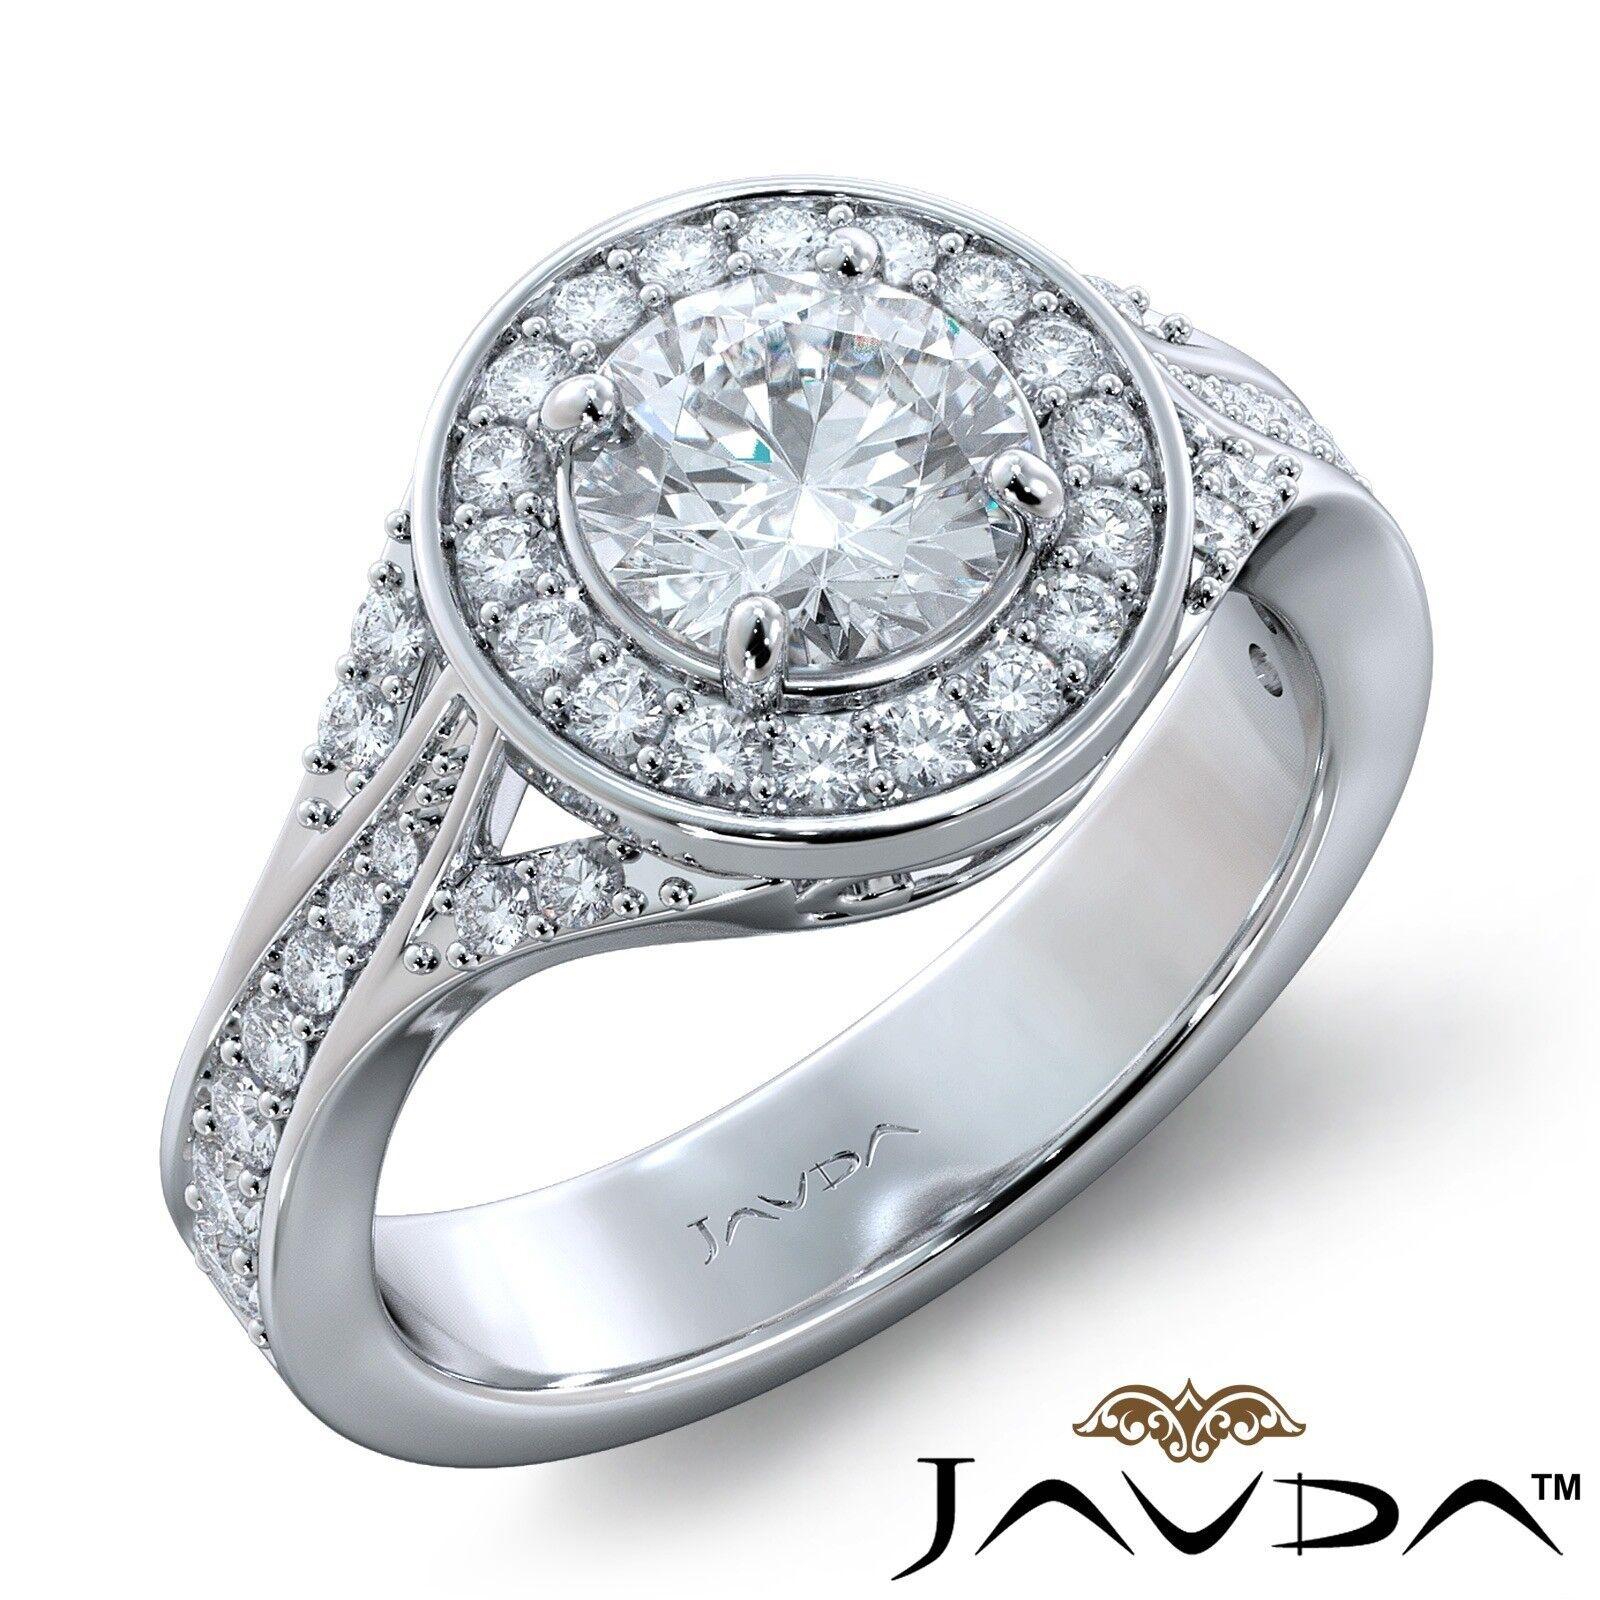 2.15ctw Halo Sidestone Pave Round Diamond Engagement Ring GIA G-VS1 White Gold